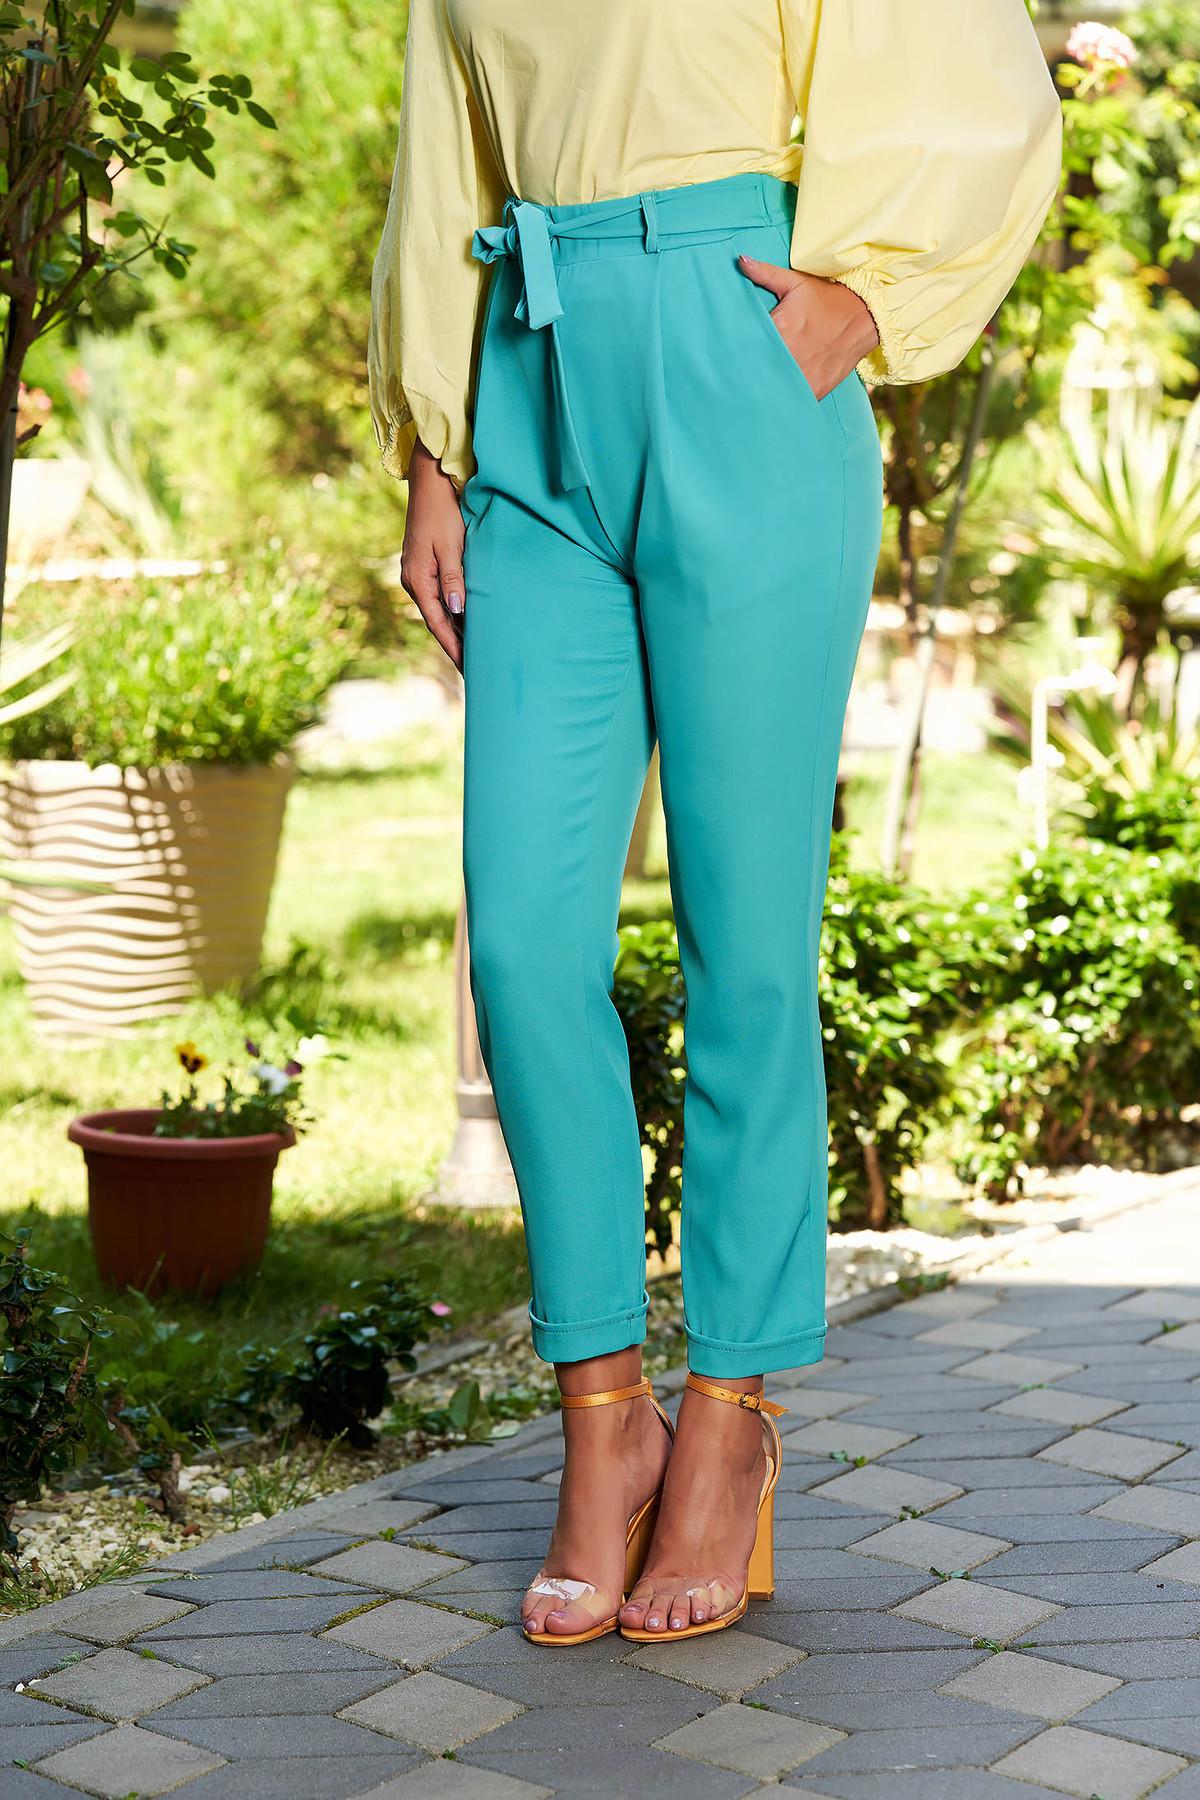 Pantaloni turcoaz casual lungi cu buzunare in fata accesorizati cu cordon